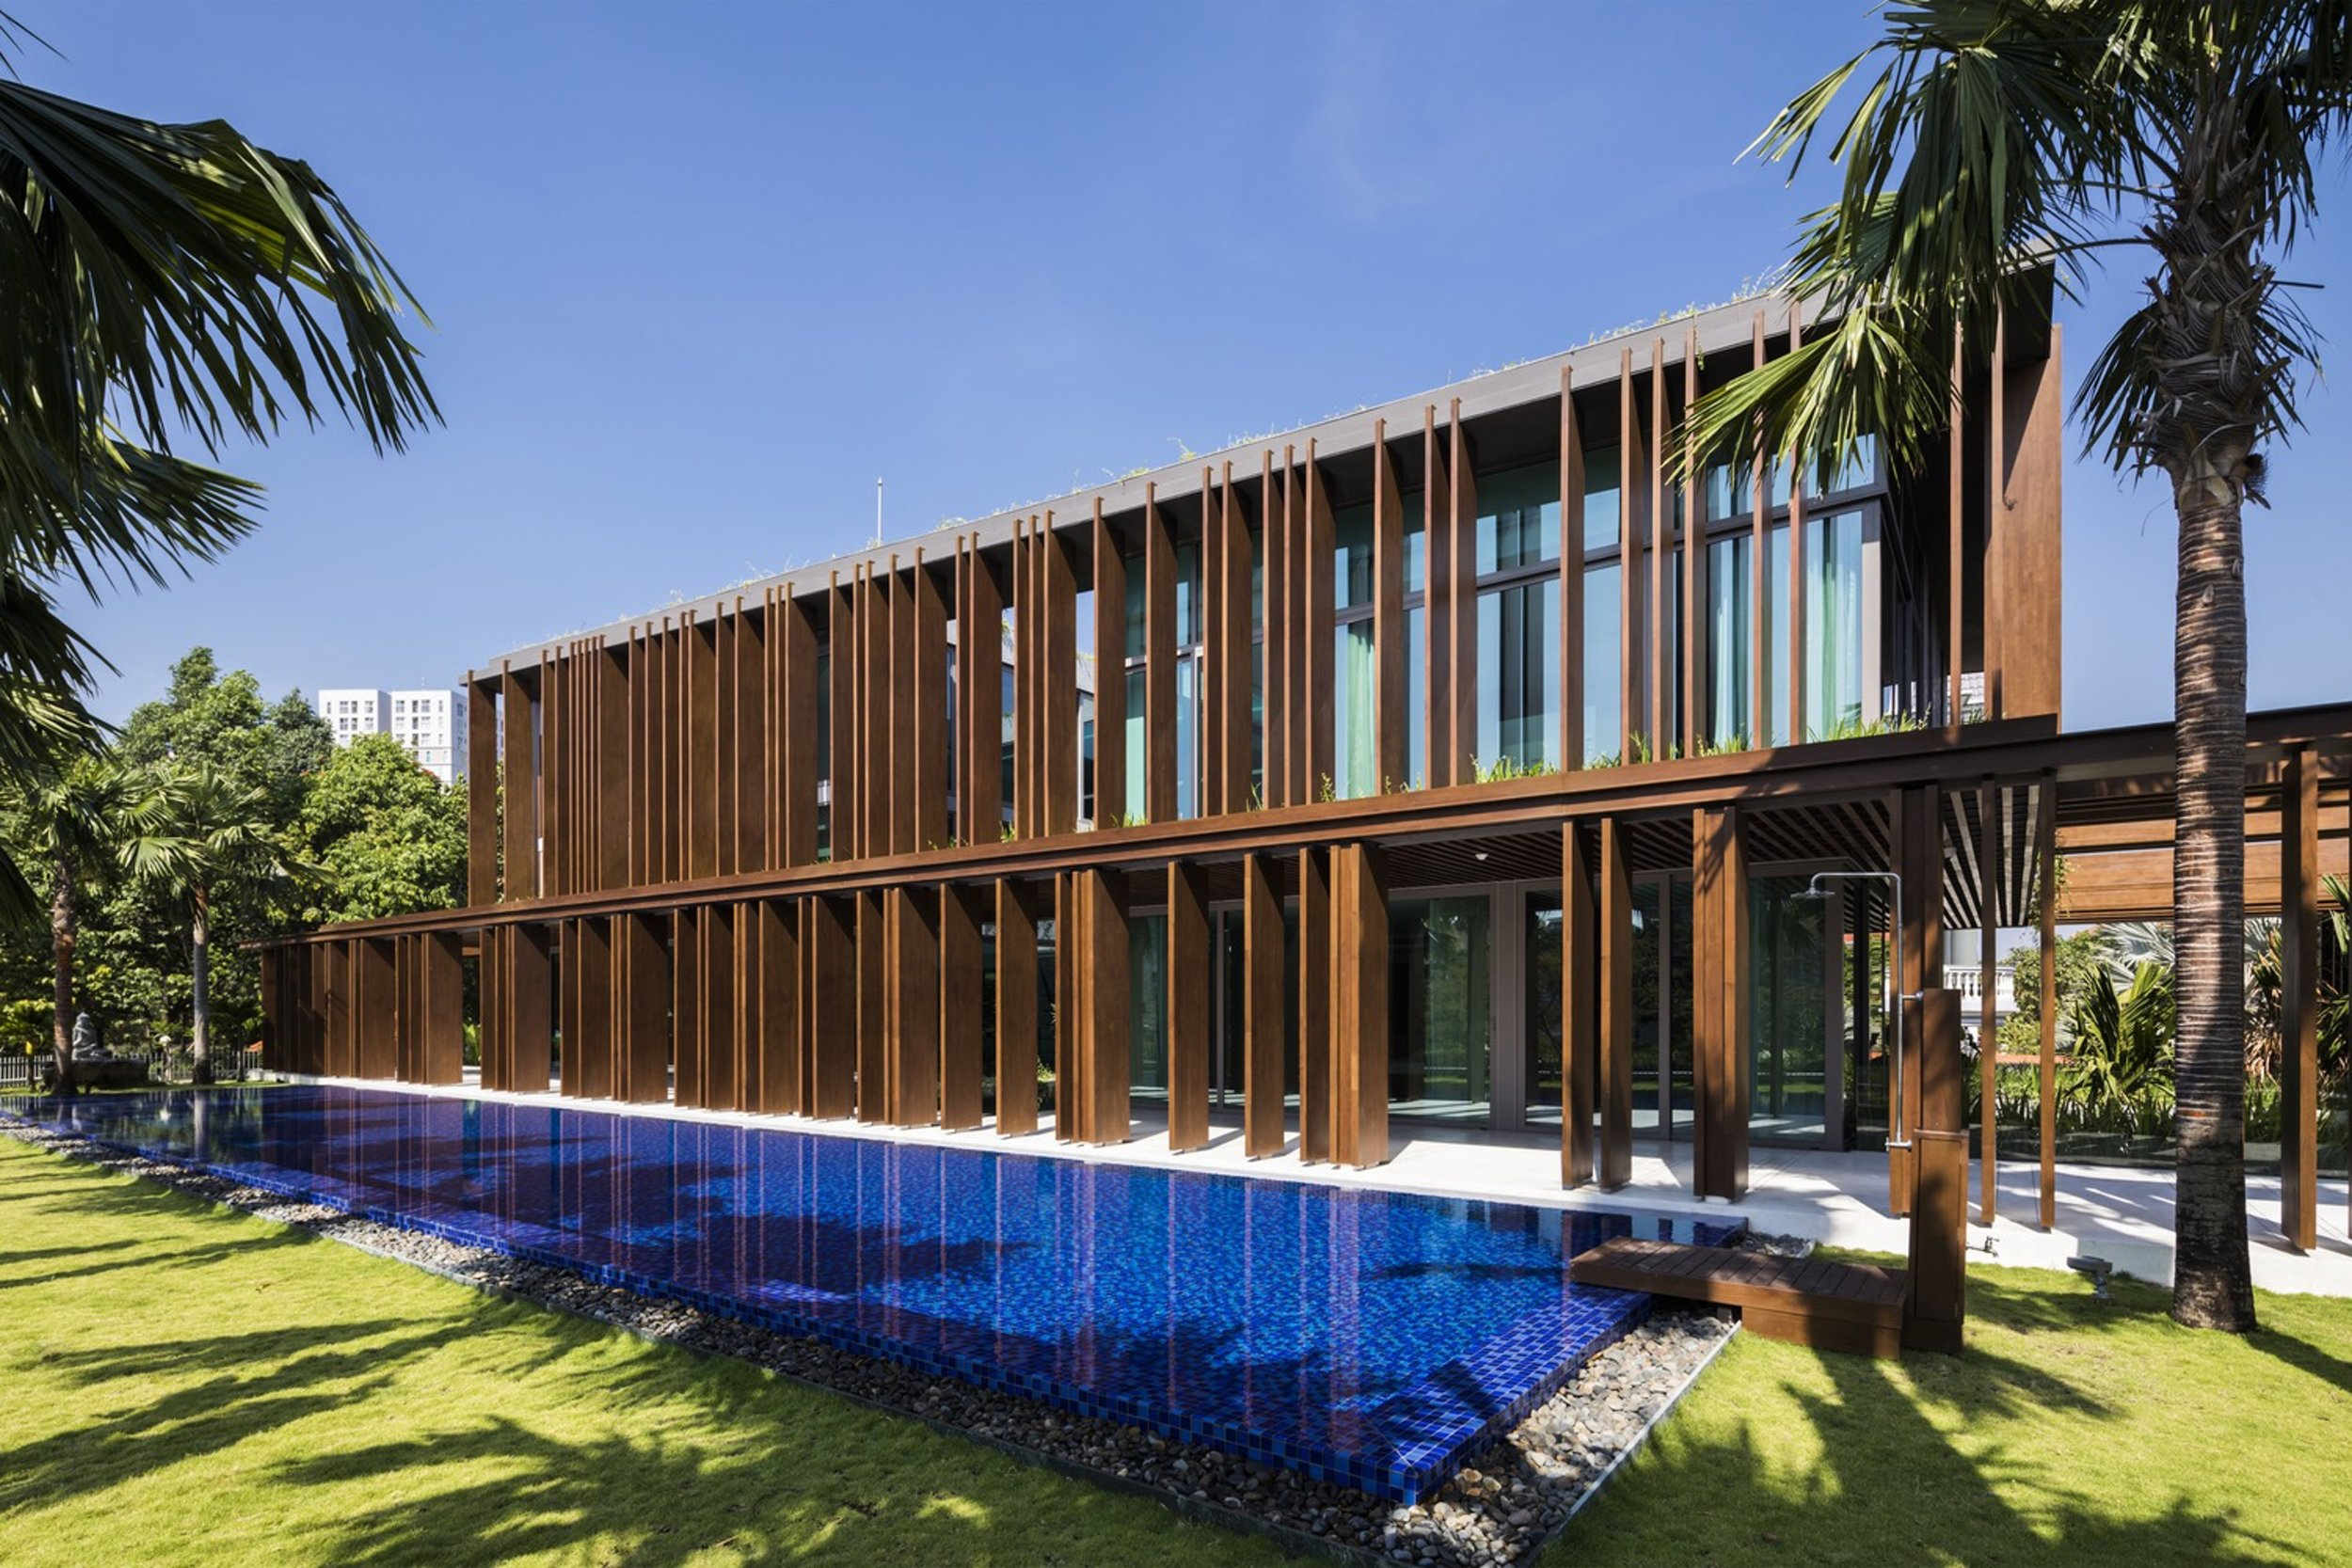 louvers-house-mia-design-studio-3.jpg